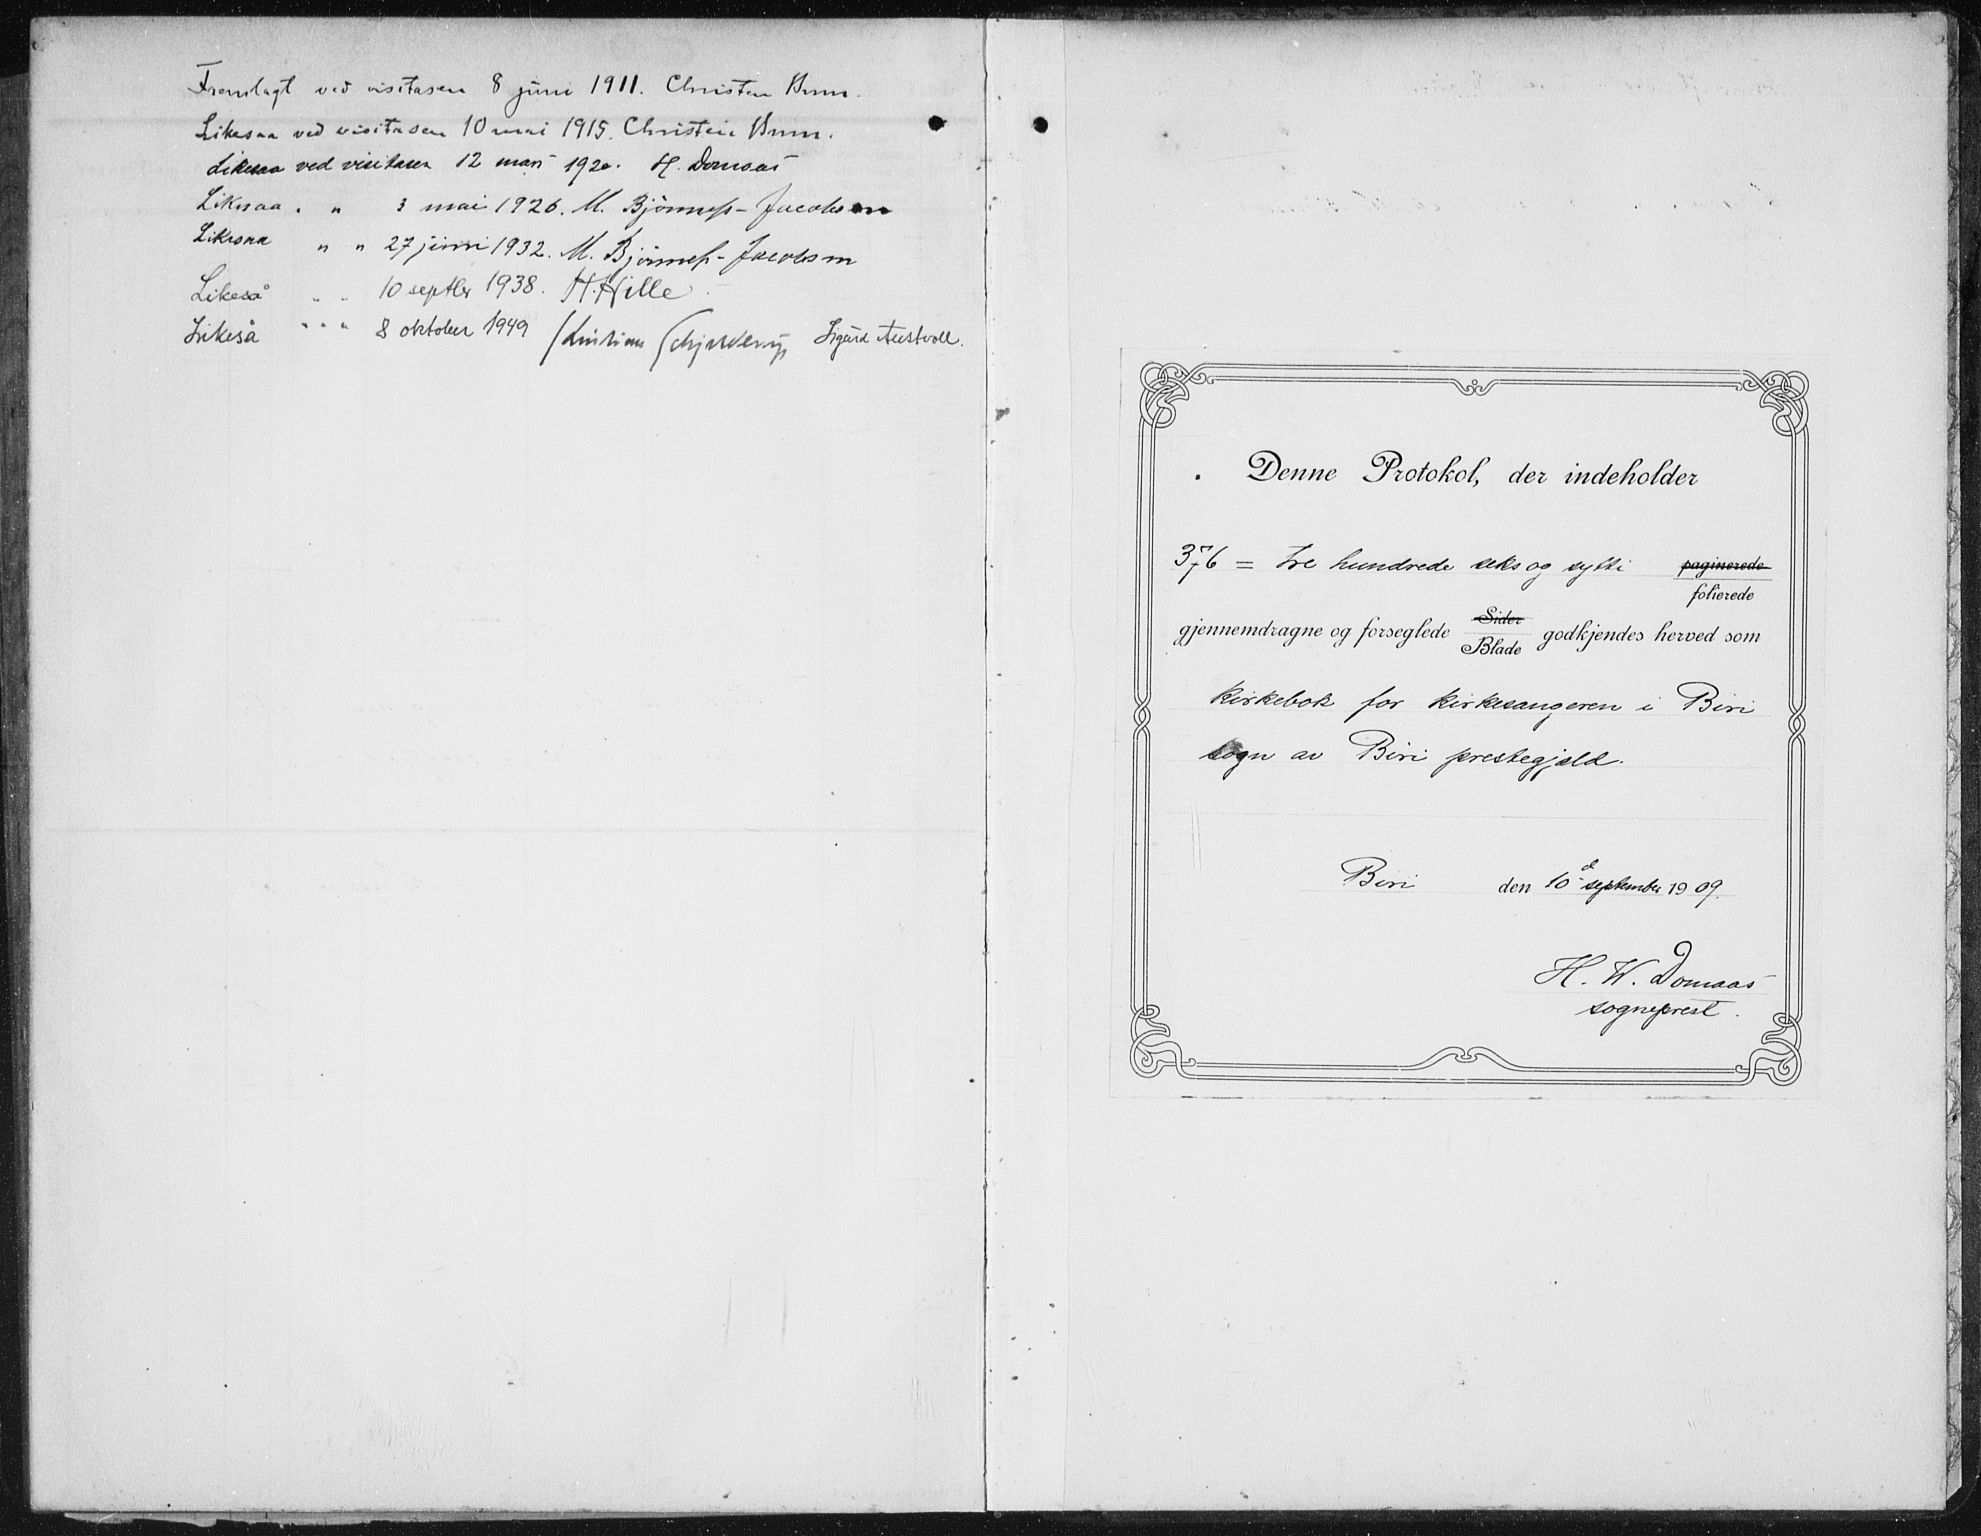 SAH, Biri prestekontor, Klokkerbok nr. 6, 1909-1938, s. 366